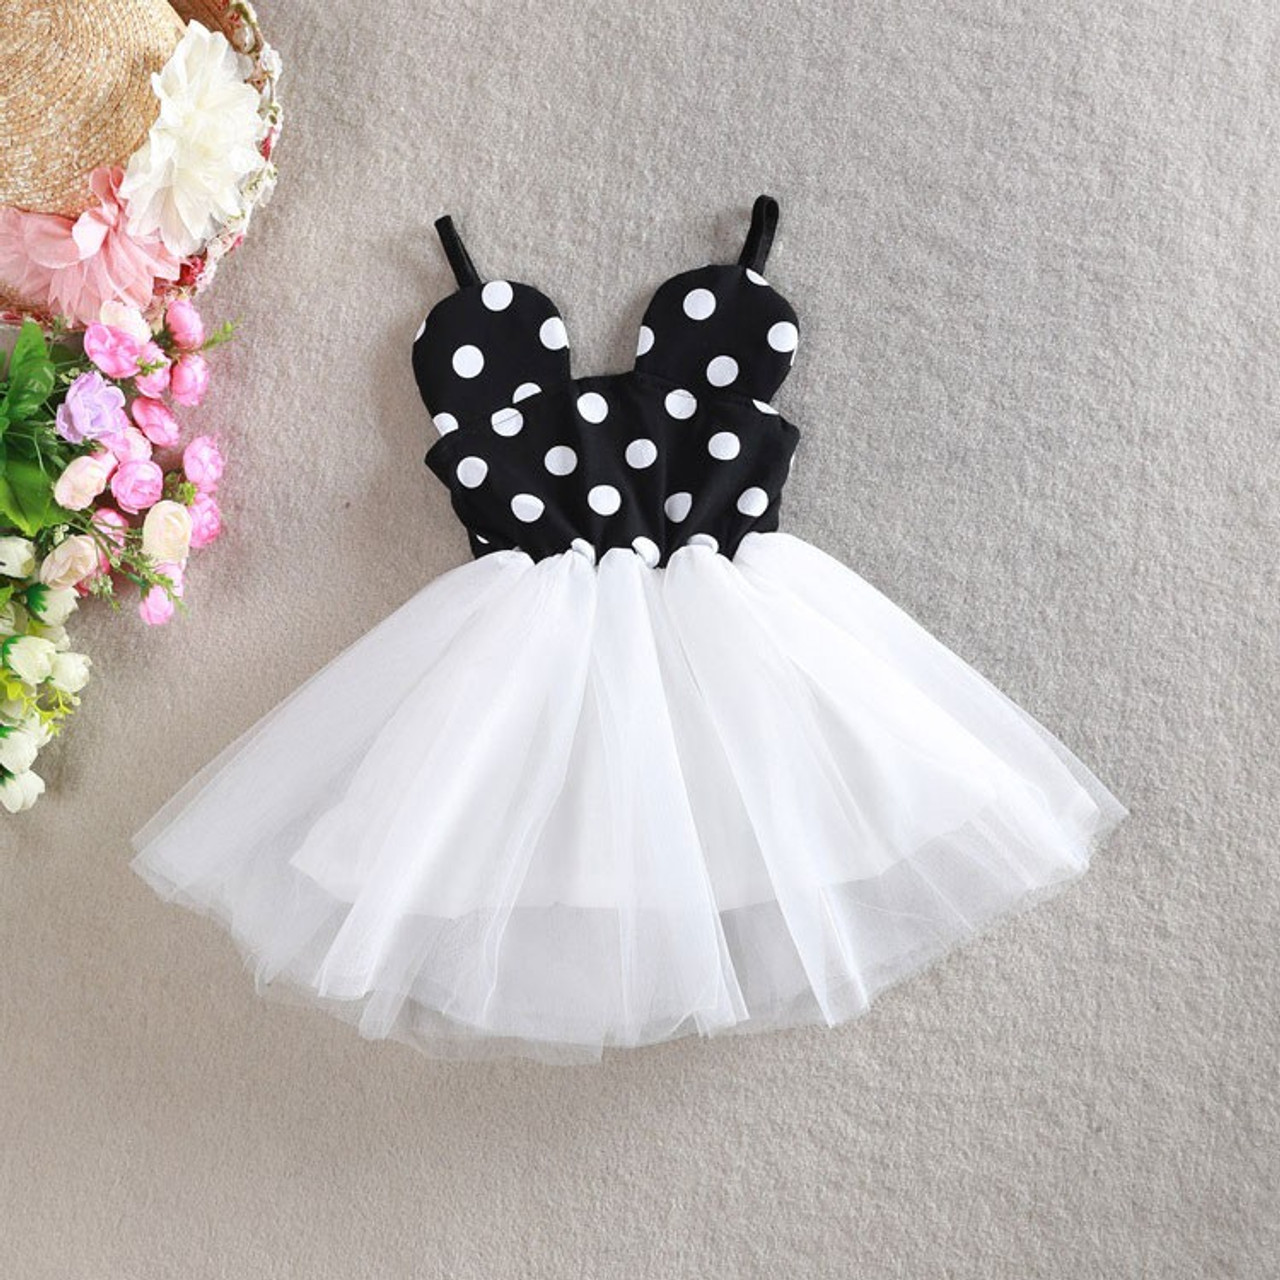 Minnie Mouse Inspired Black White Polka Dot White Birthday Party Dress